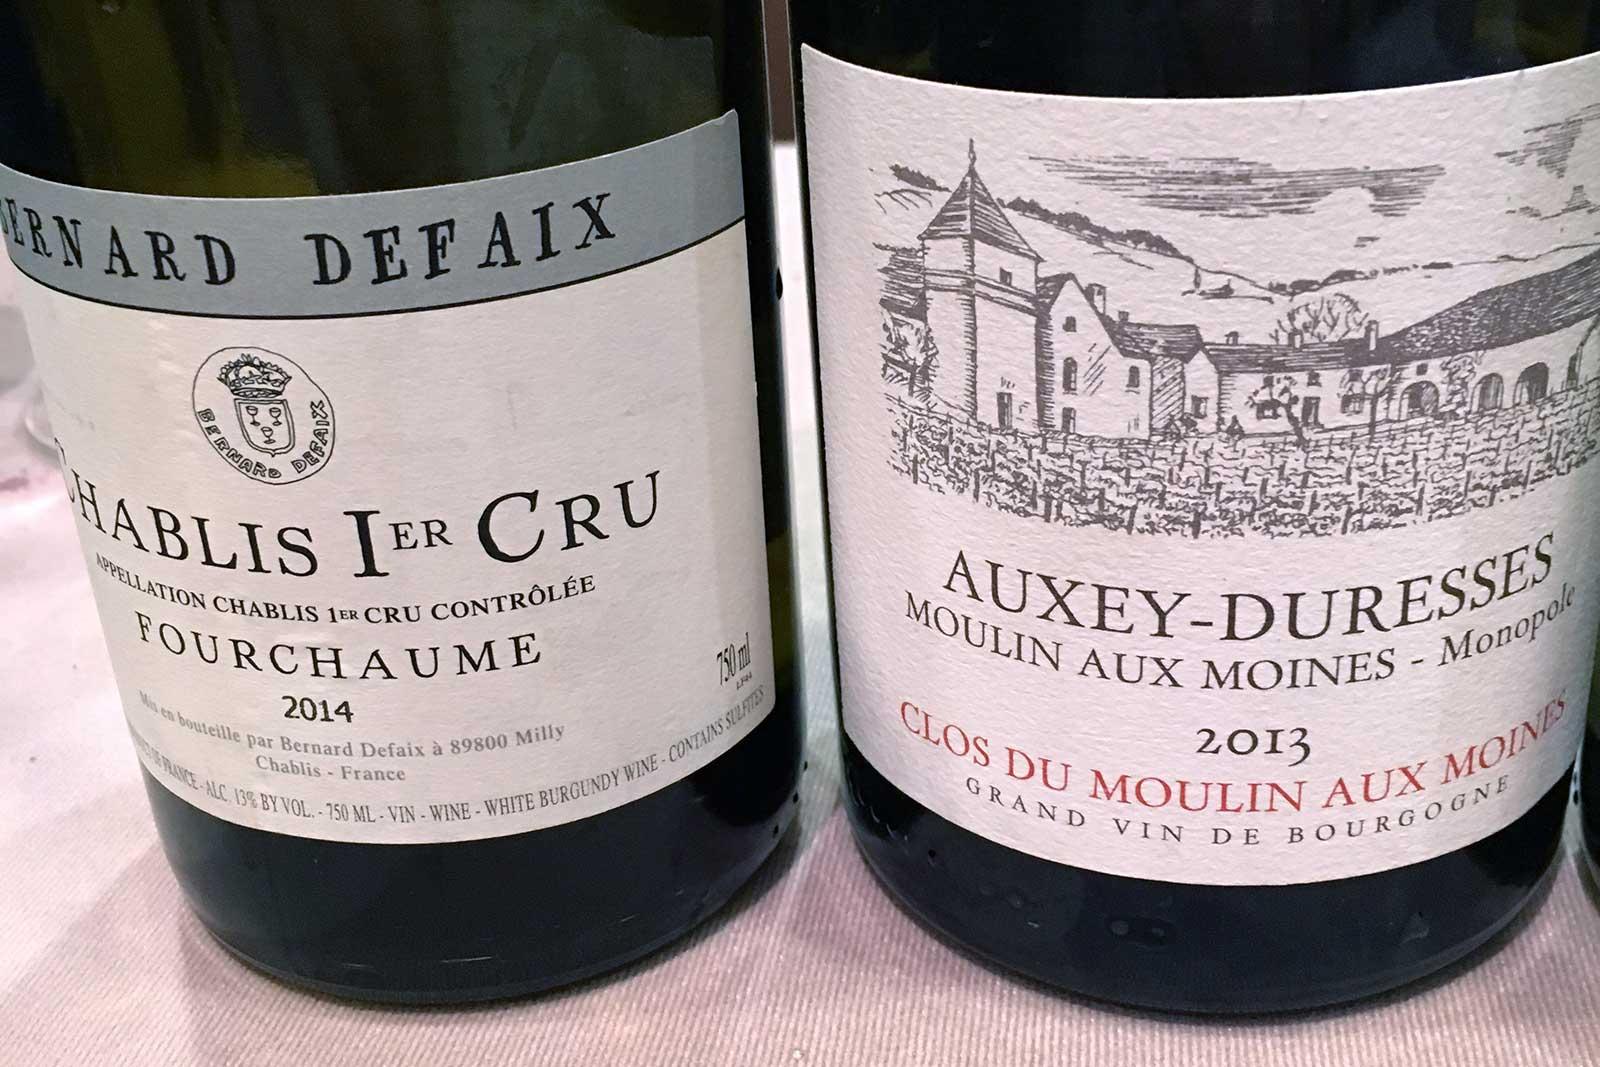 Wines being poured at the Boulder Burgundy Festival 2016, including Bernard Defaix Chablis